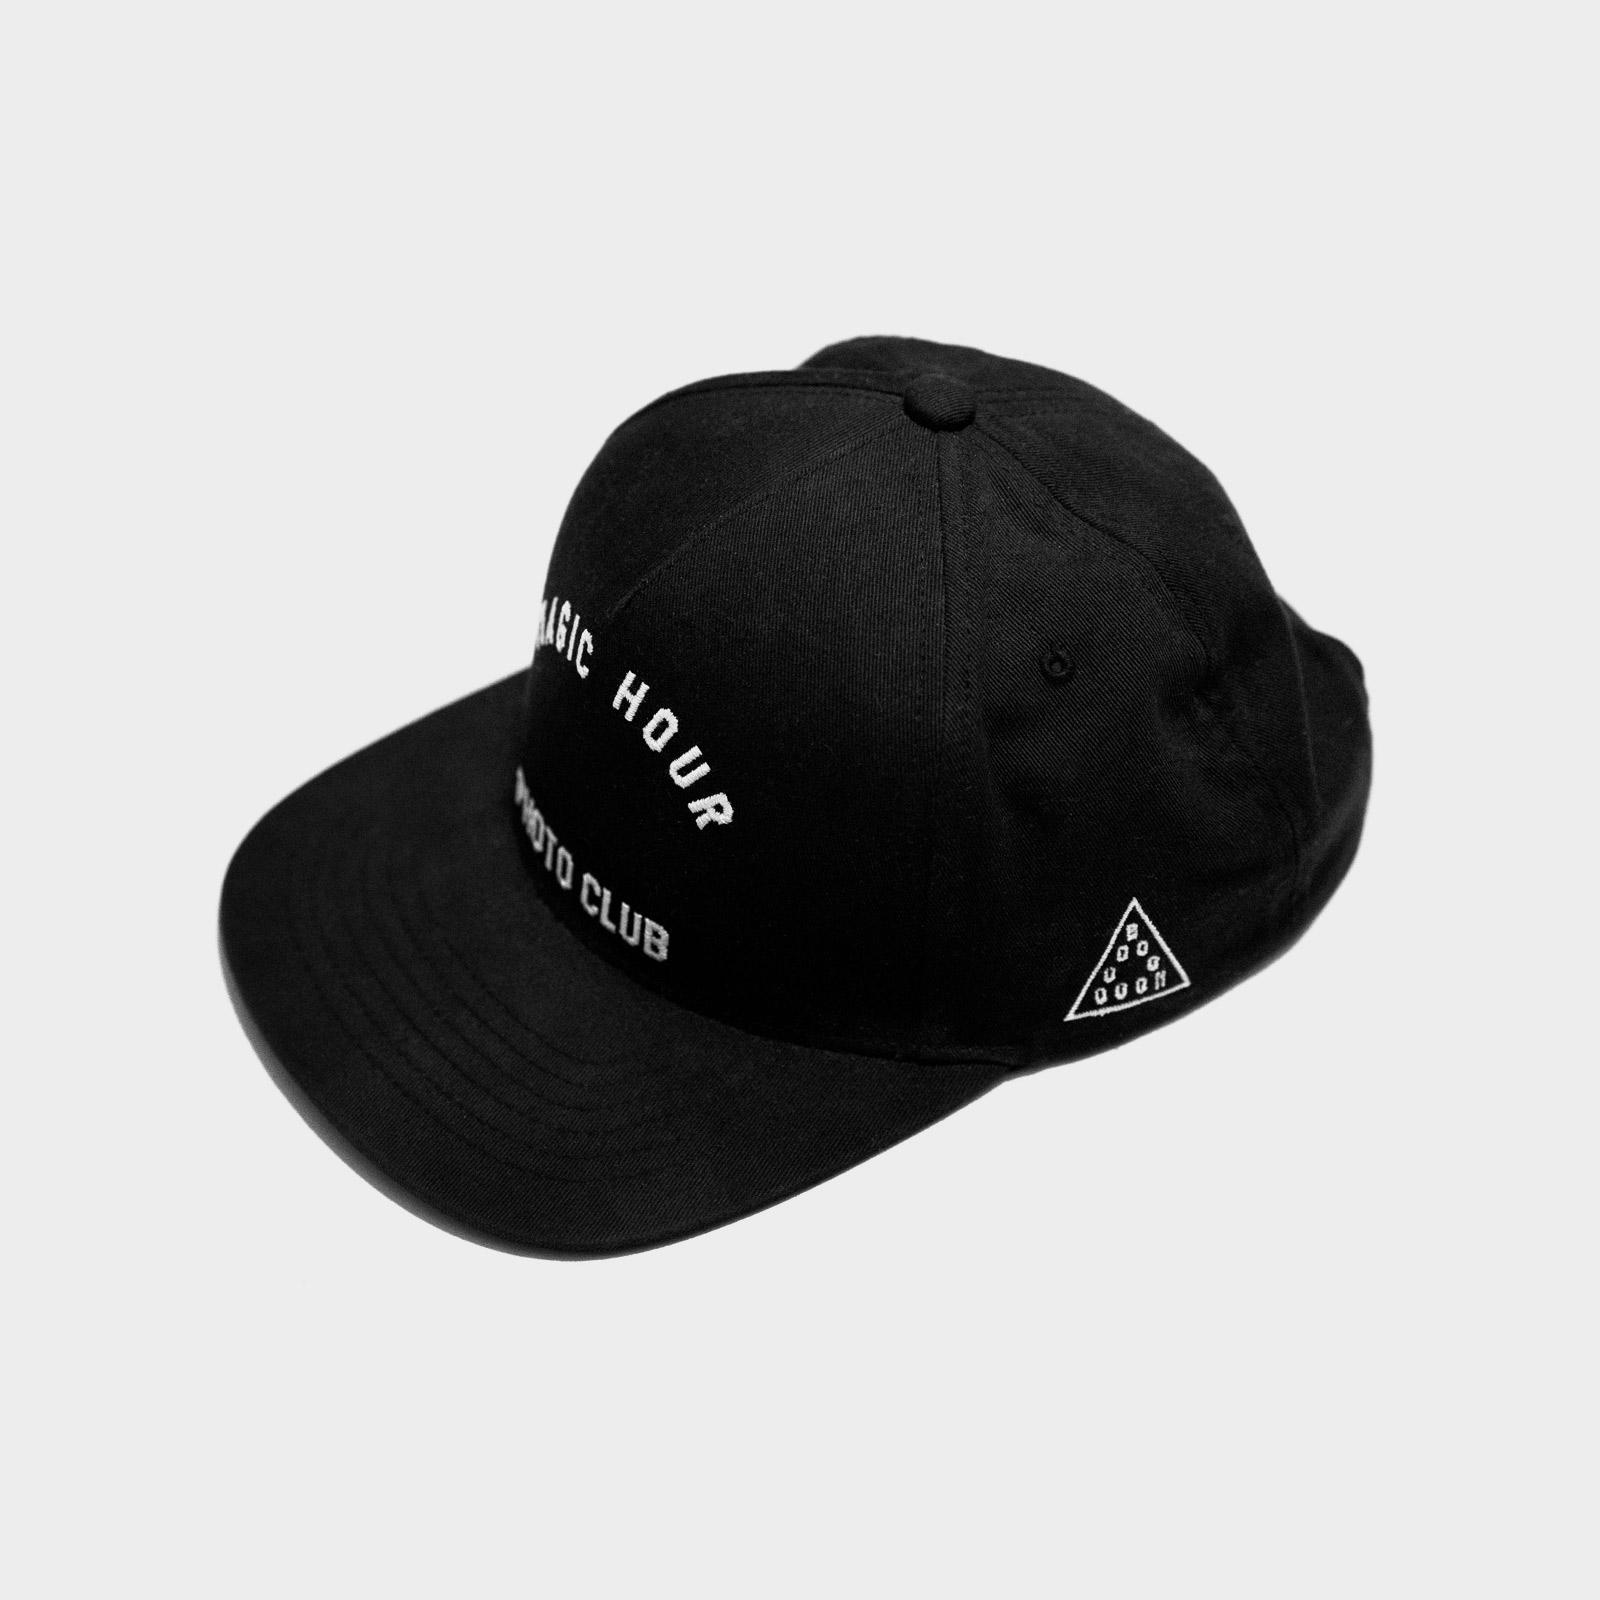 Magic Hour Photo Club Hat